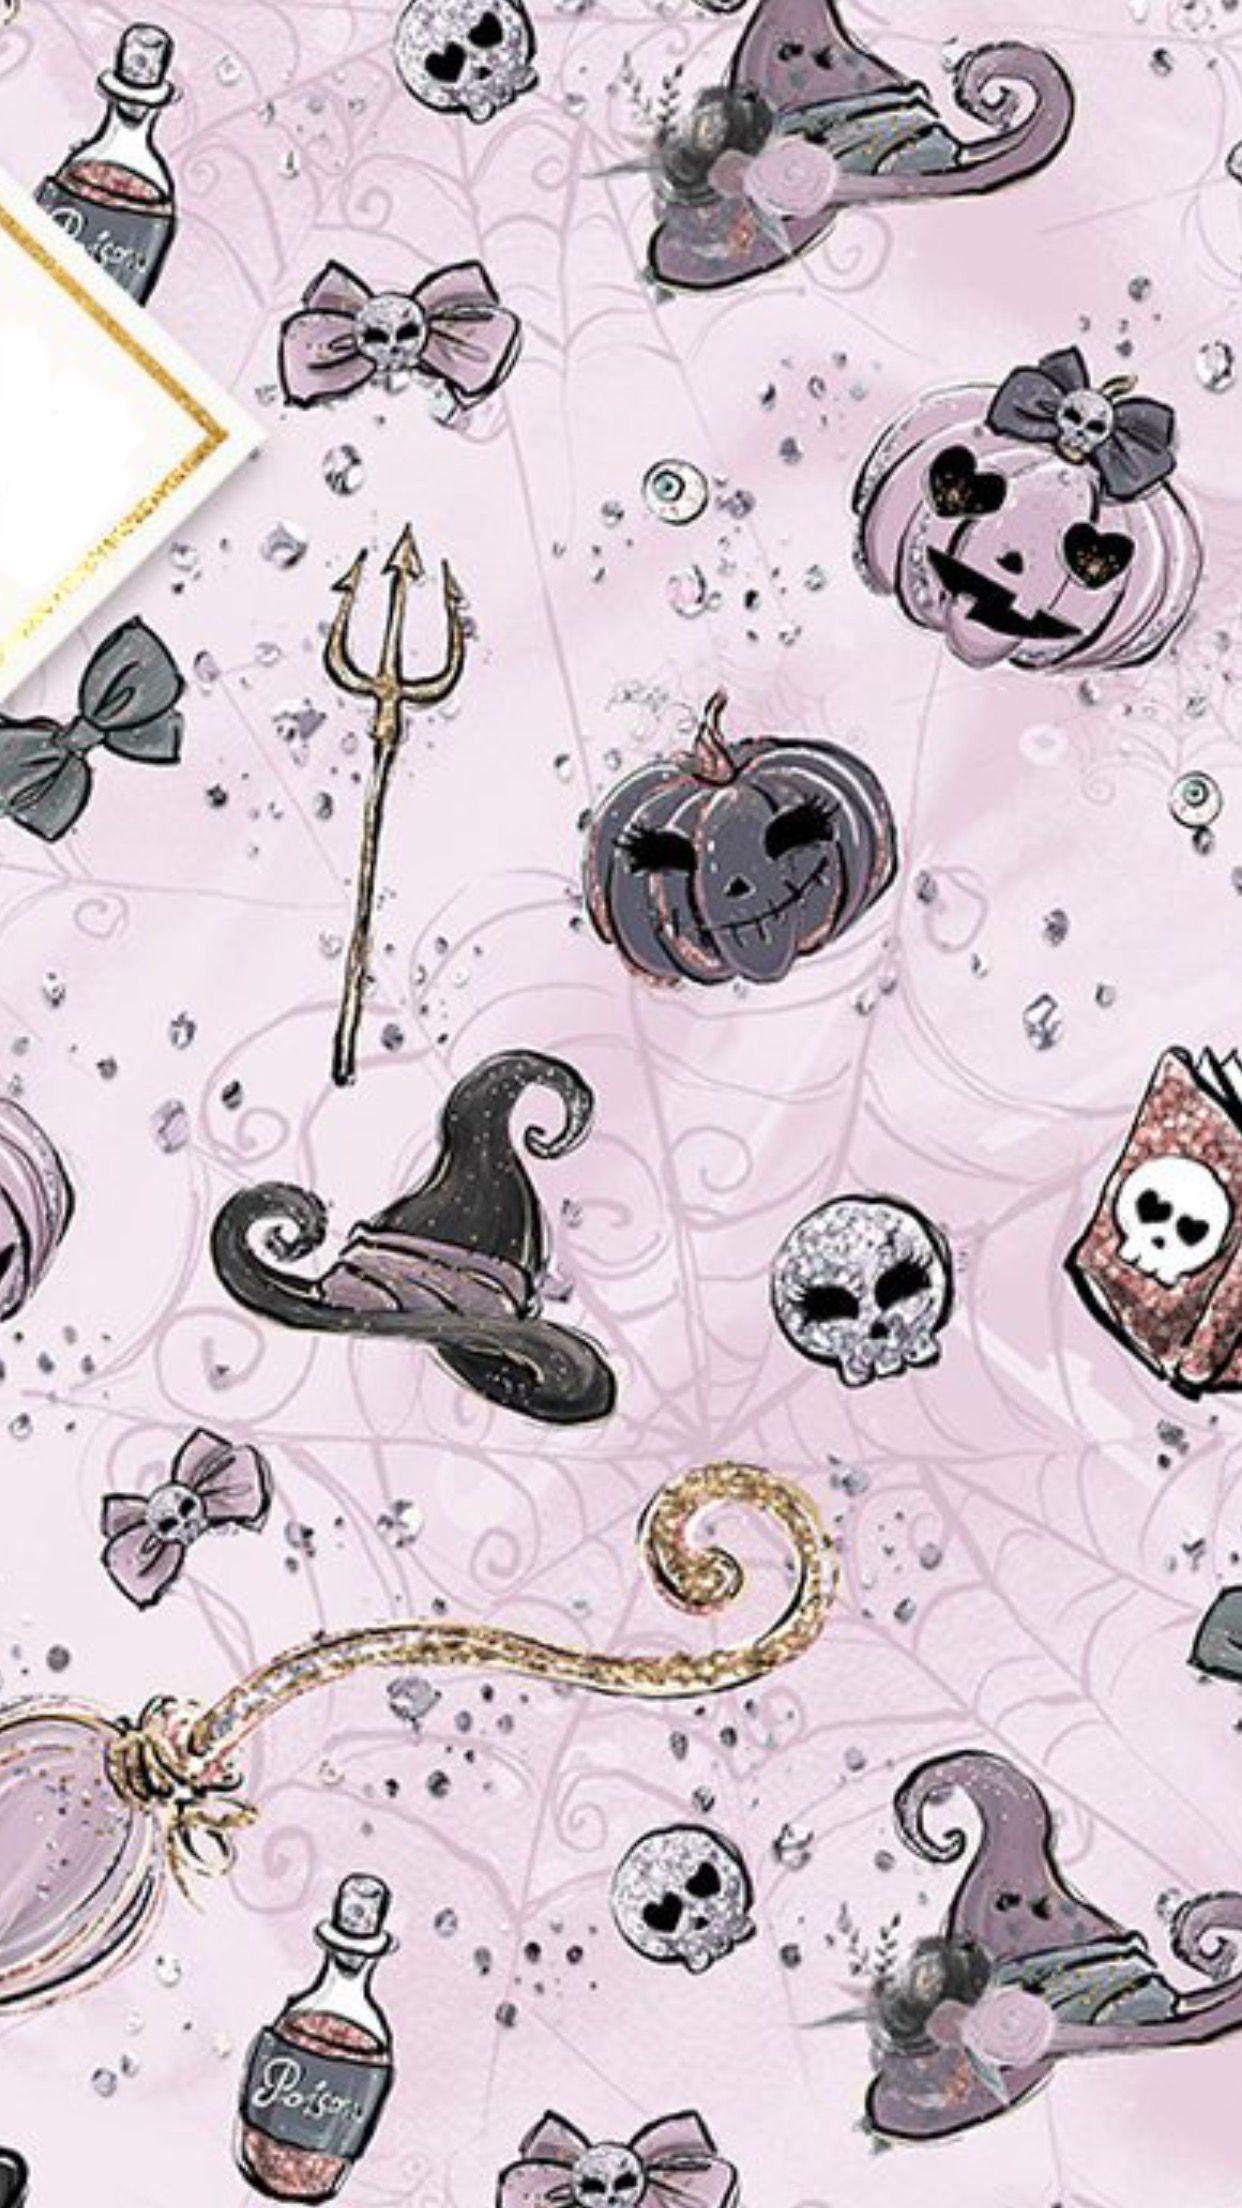 Pin By Theresa Ross On Halloween Halloween Wallpaper Iphone Halloween Wallpaper Witchy Wallpaper